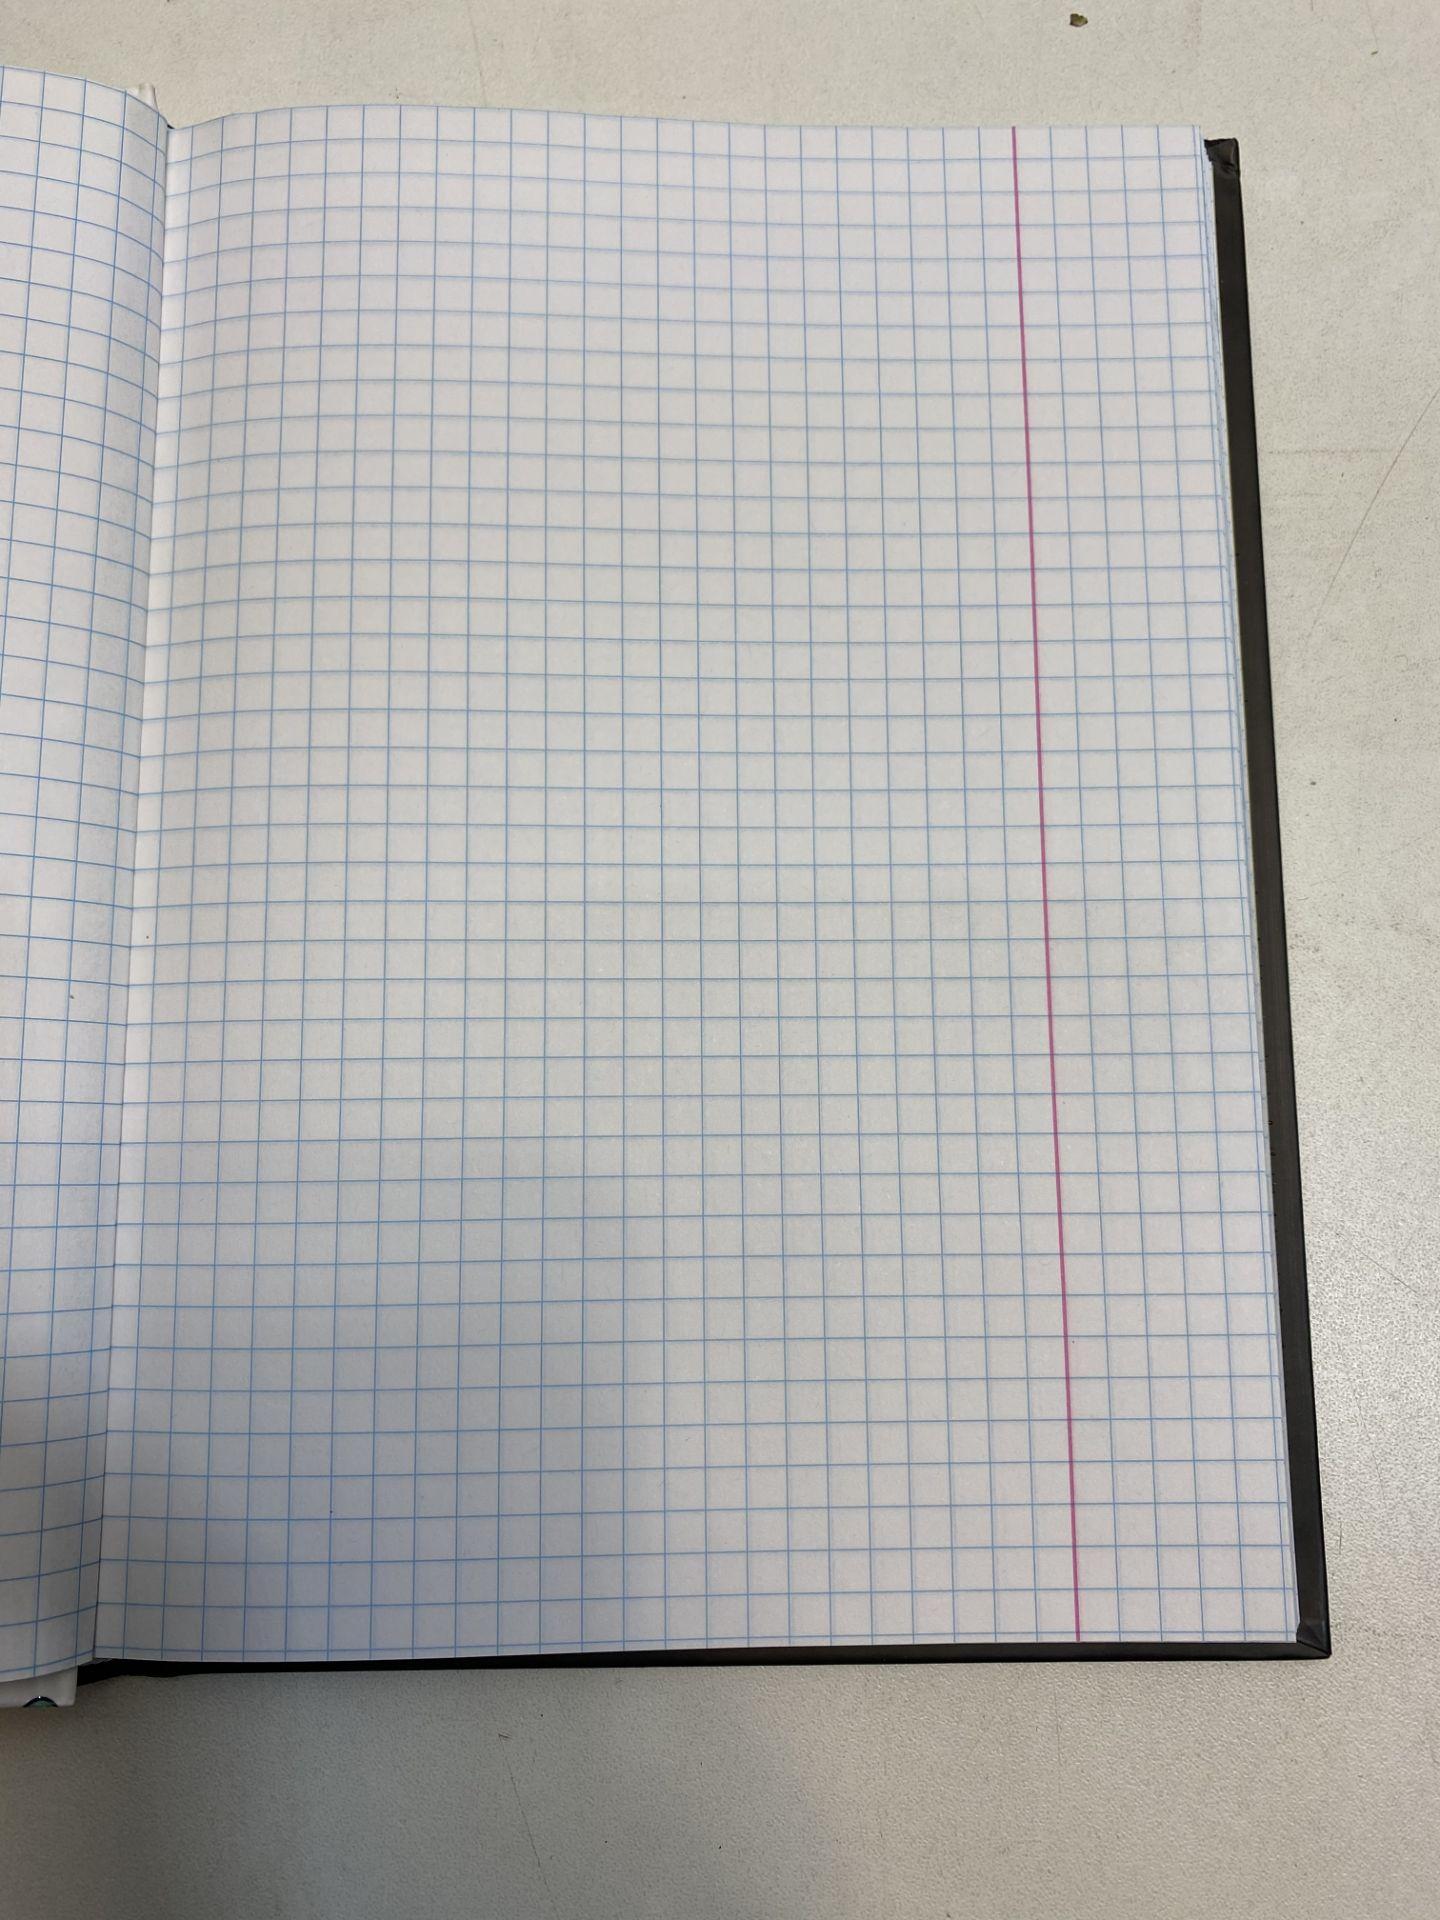 "3 x ""Chic Glamour Fabulous"" White Grid Notepad | 5902277221636 - Image 4 of 4"